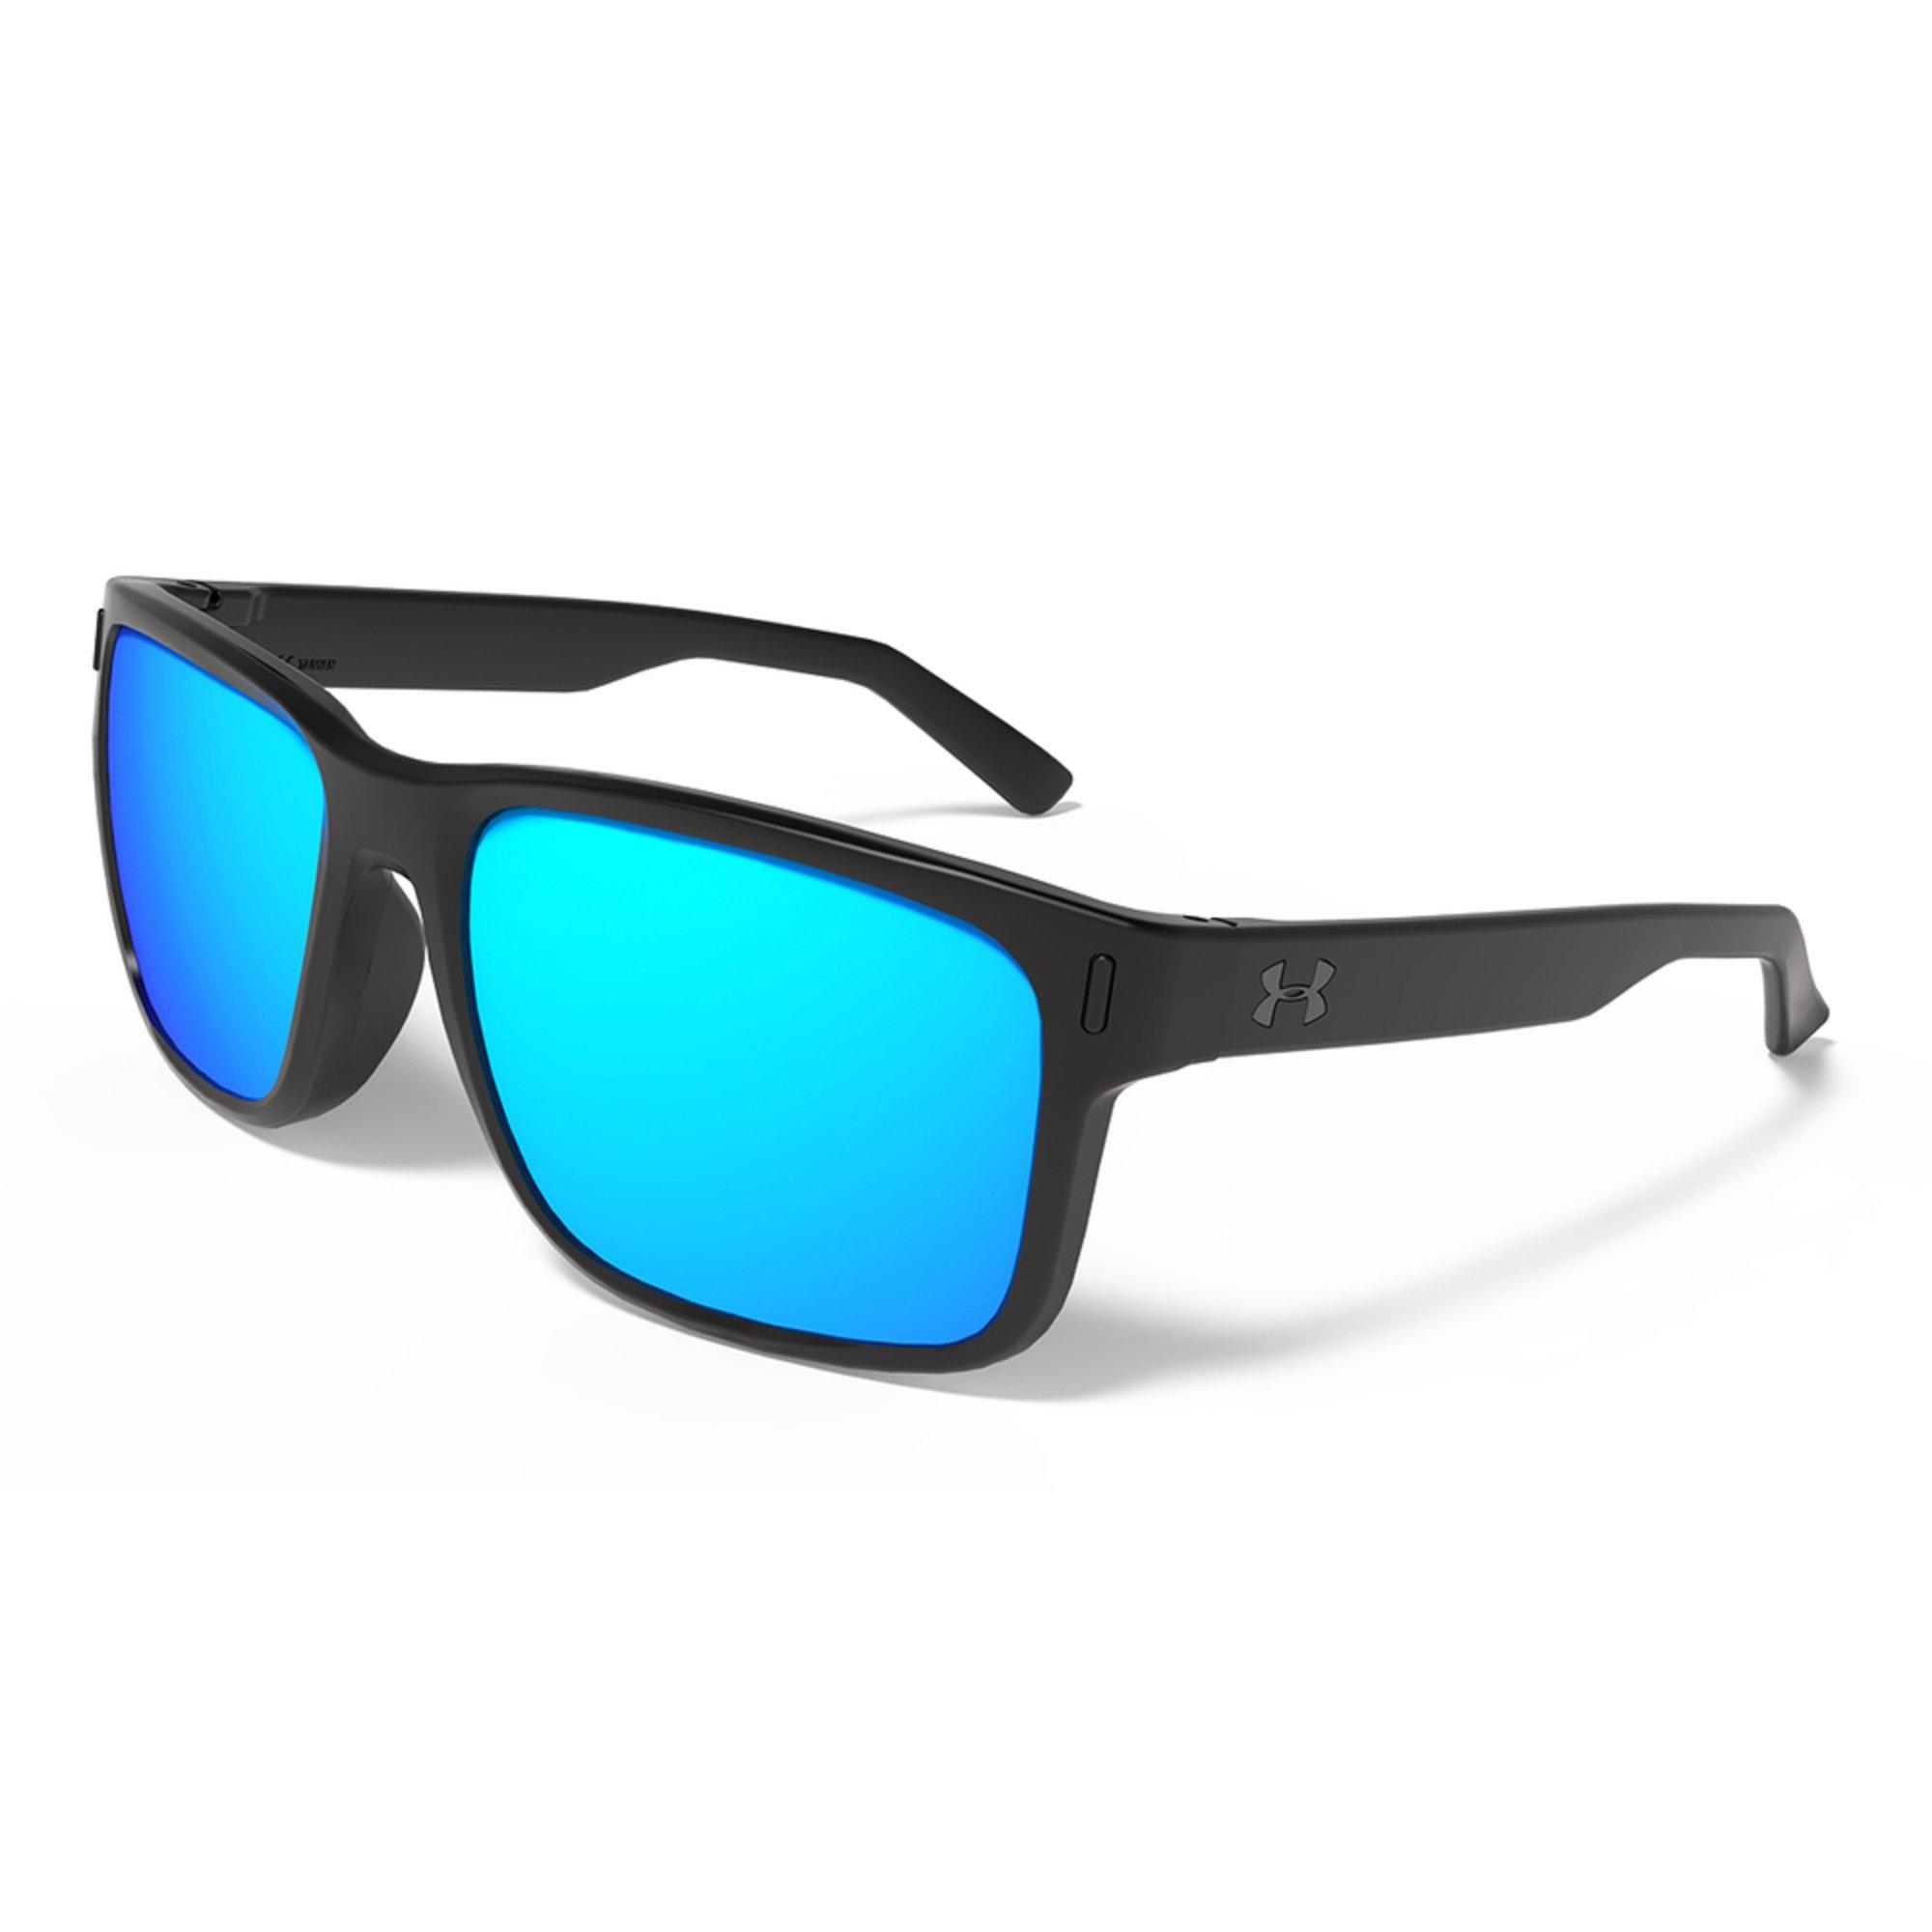 1db2e98713 Under Armour Sunglasses Sale